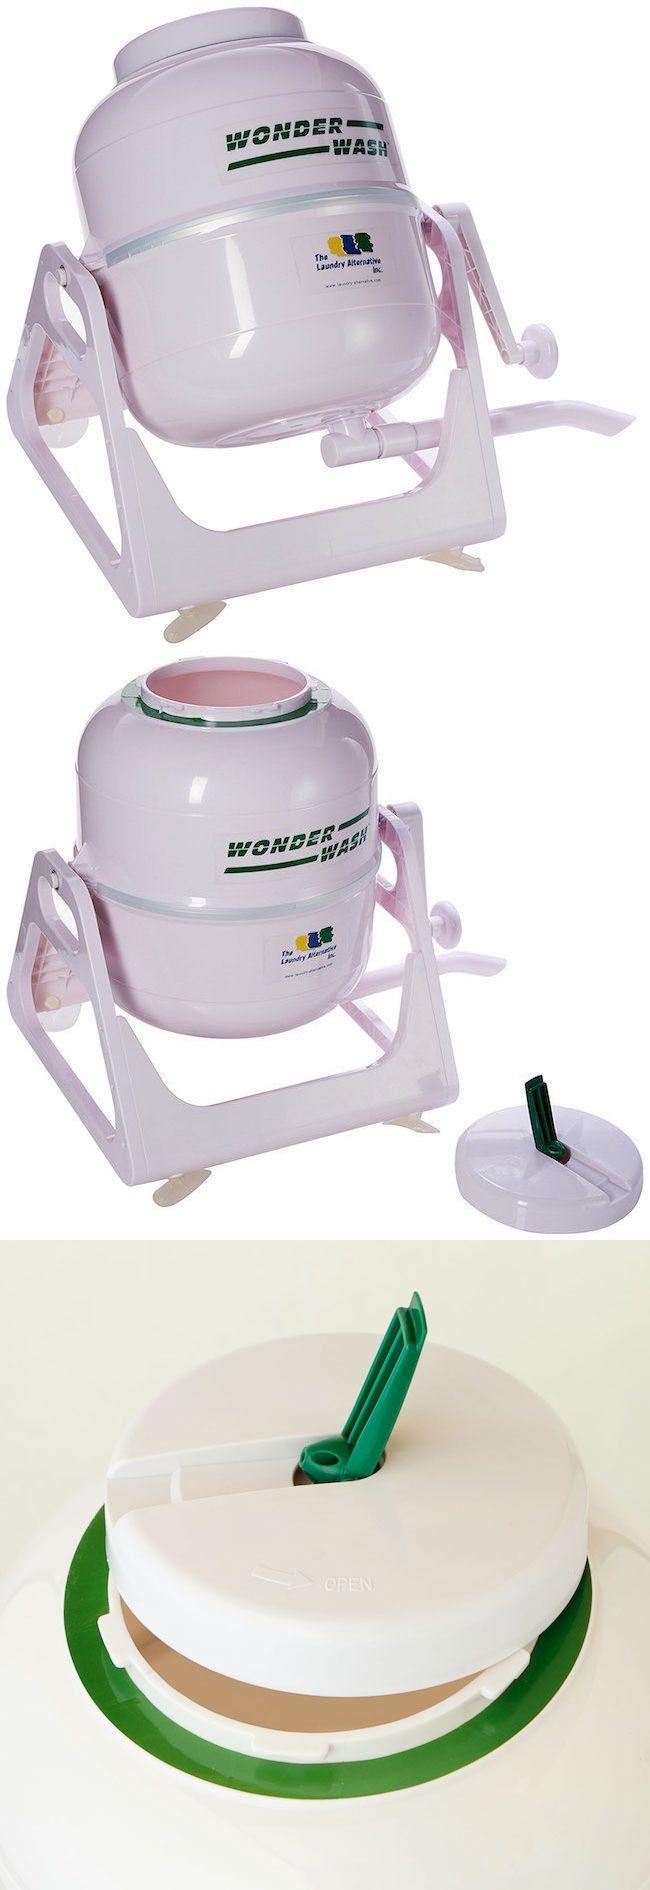 Washing Machines 71256: Portable Washing Machine Hand Manual Mini Apartment  Washer Dorm Rv Countertop